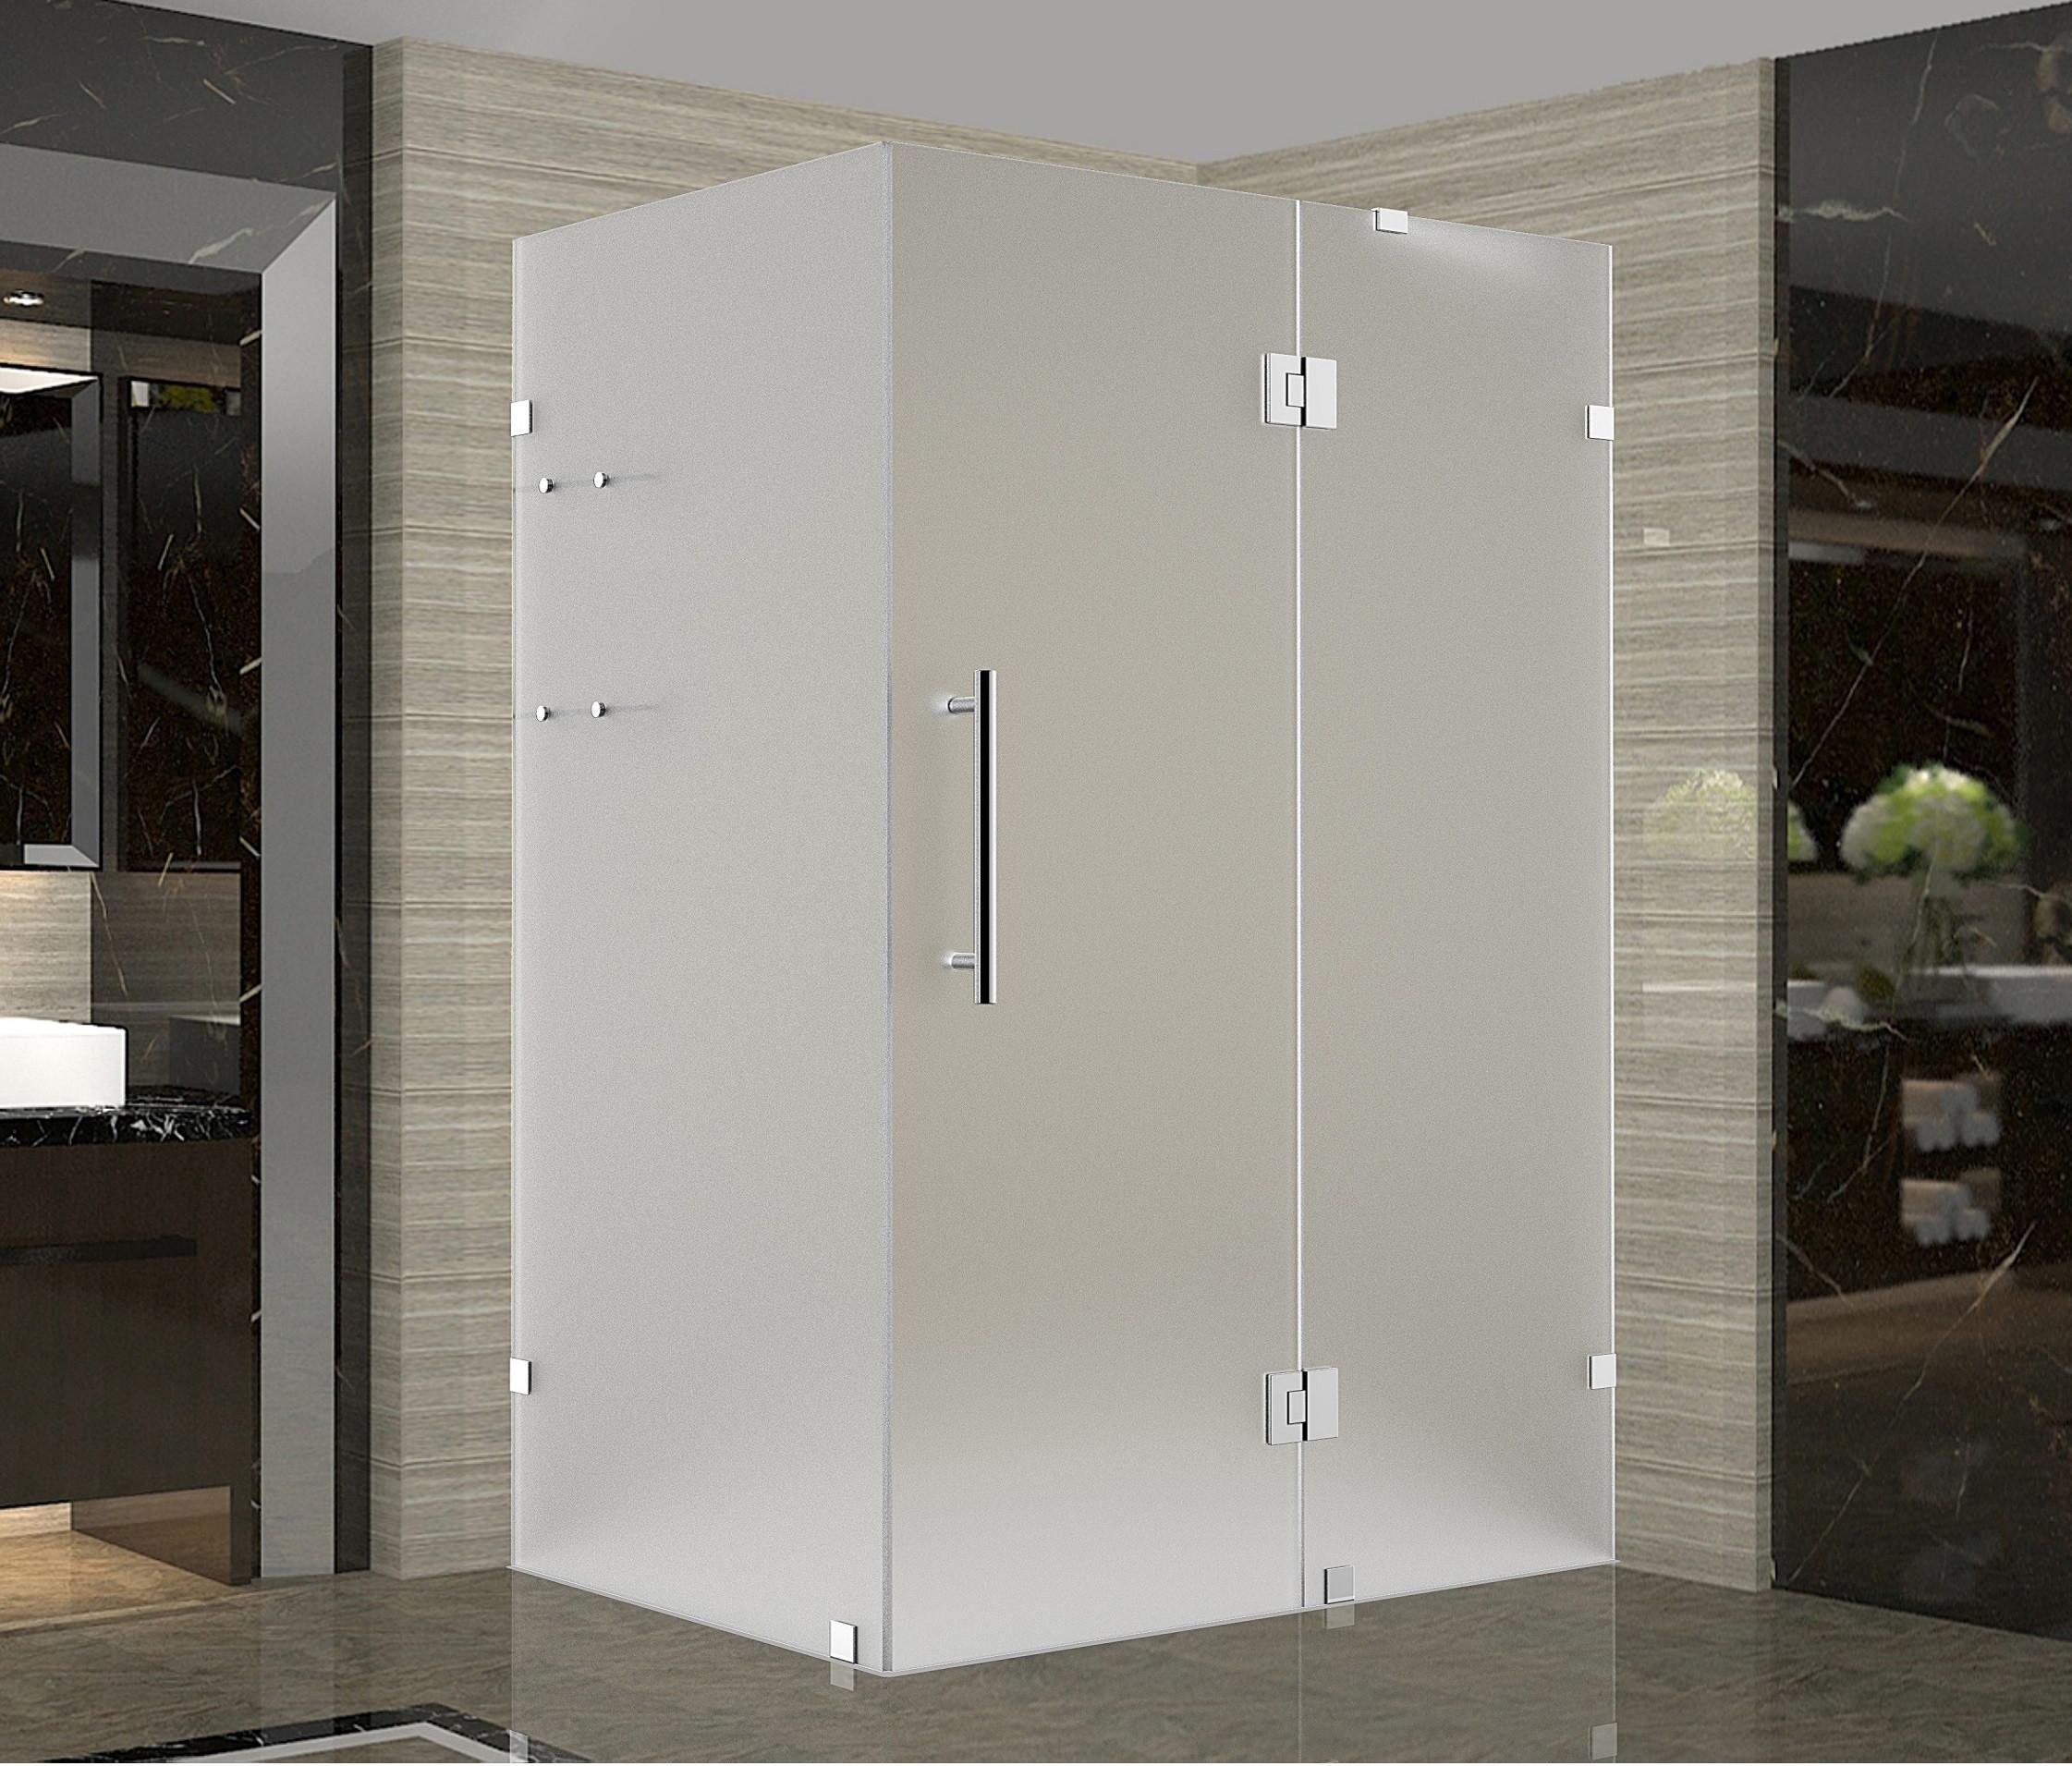 Aston Global SEN992F-SS-3934-10 Stainless Steel Completely Frameless Frosted Shower Enclosure